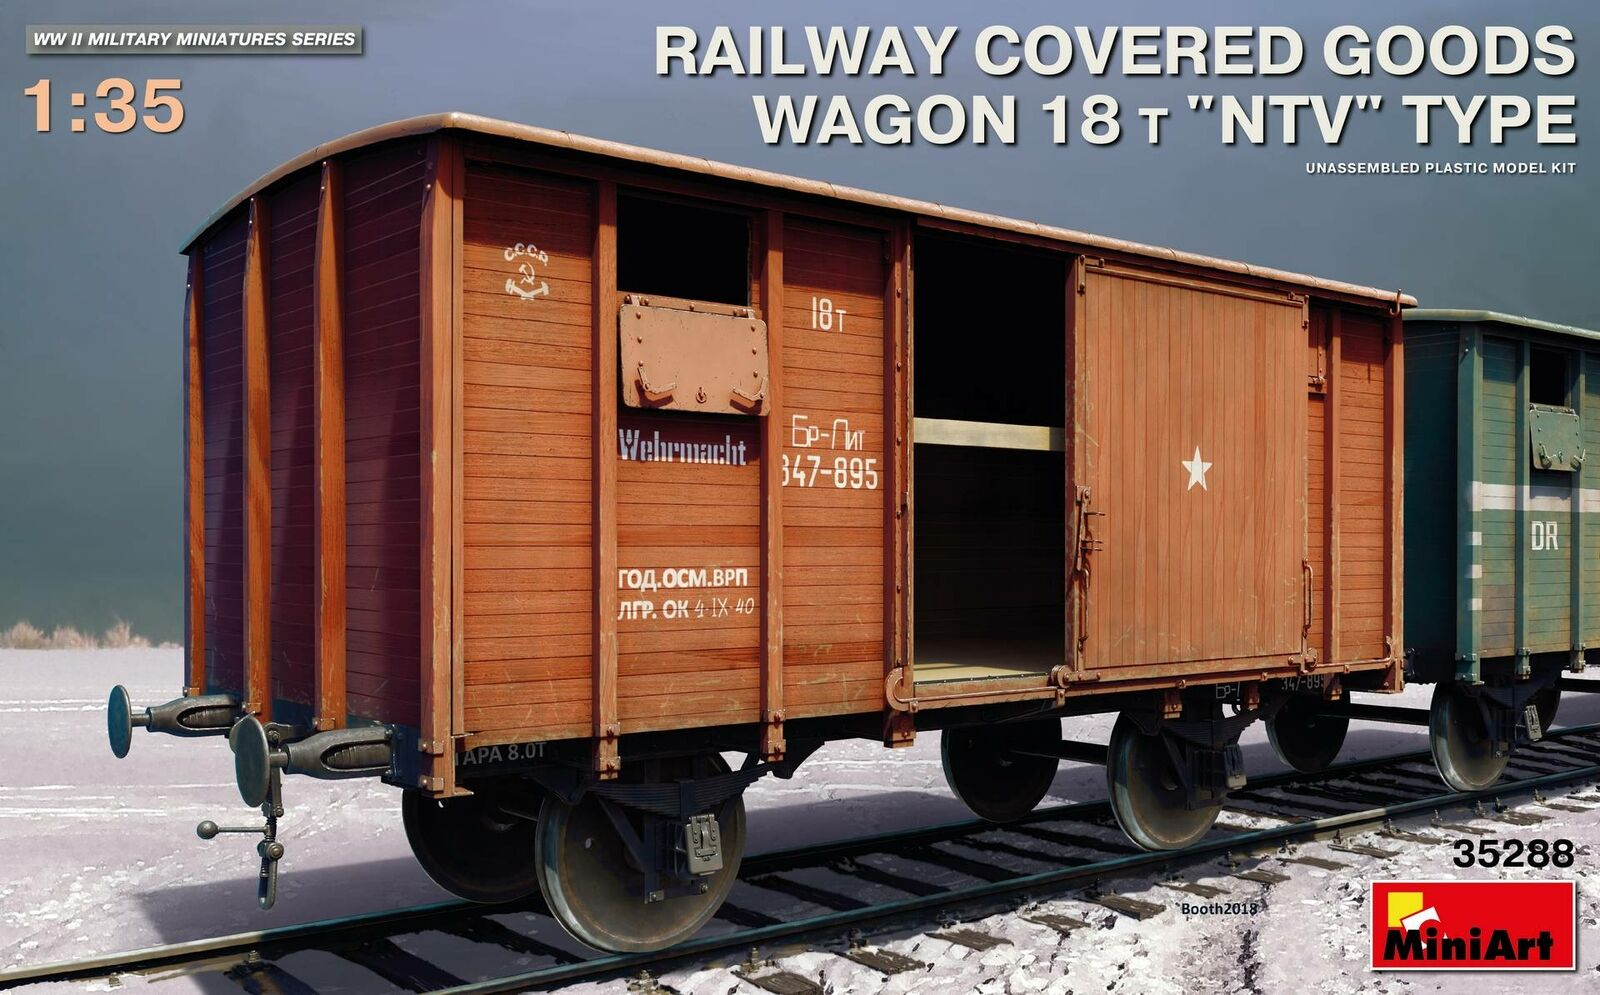 Miniart 35288 - 1/35 Ferrovia Coperto Goods Wagon 18 T